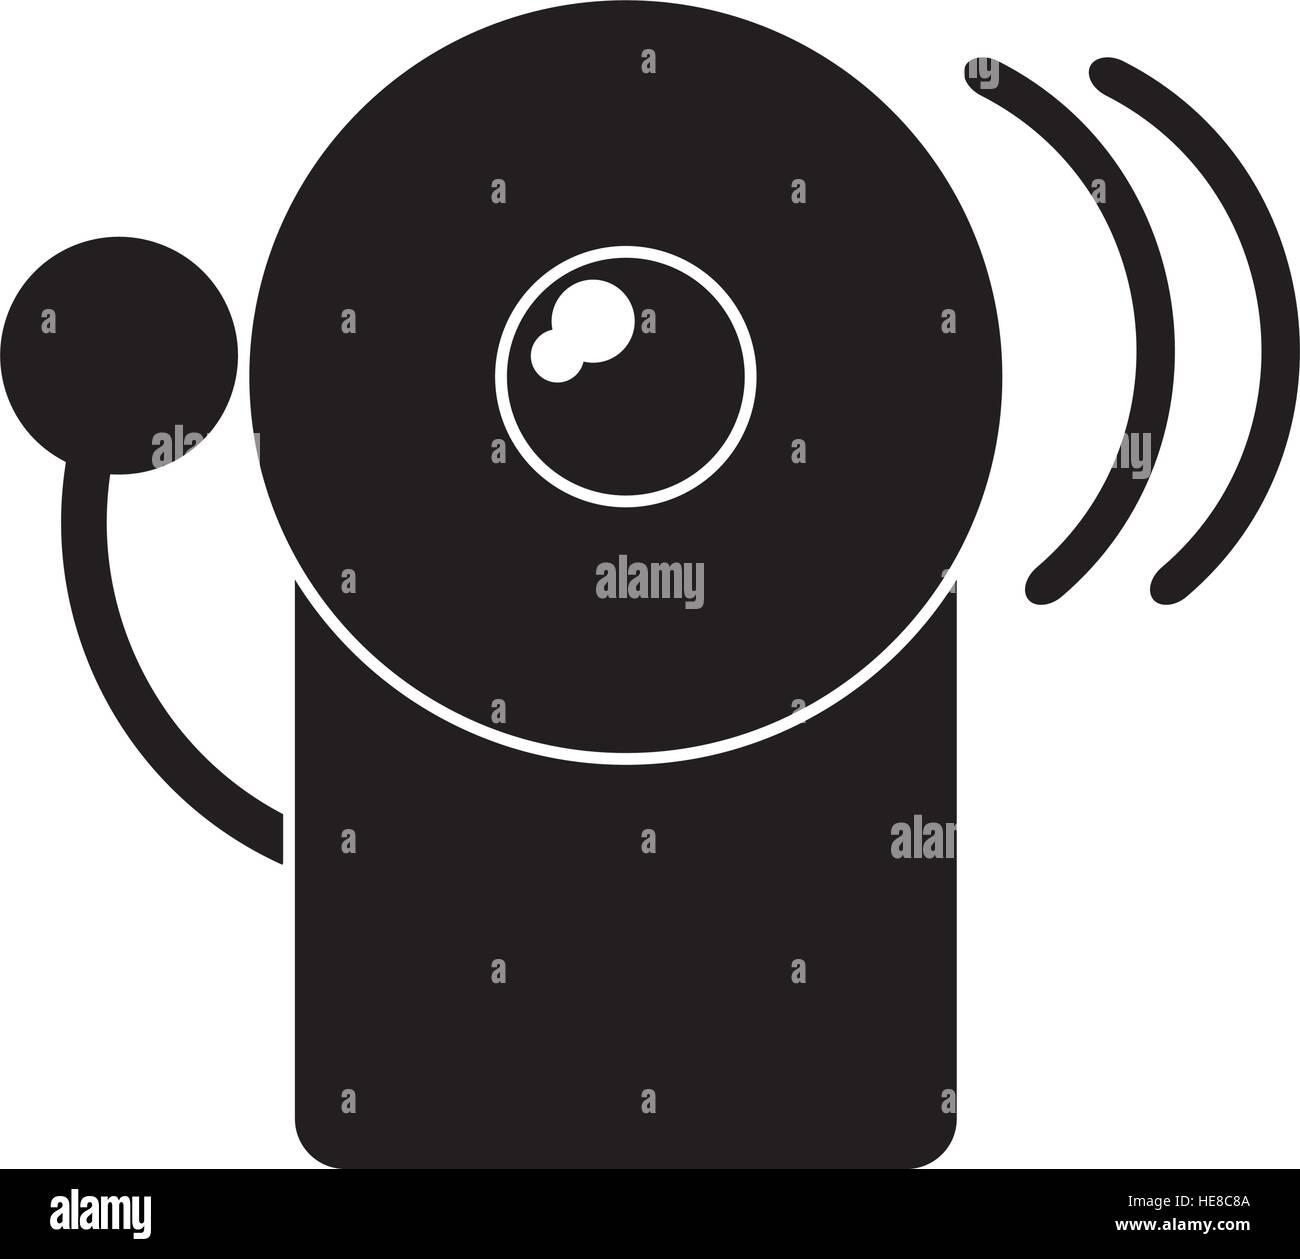 silhouette alarm fire emergency alert icon - Stock Image